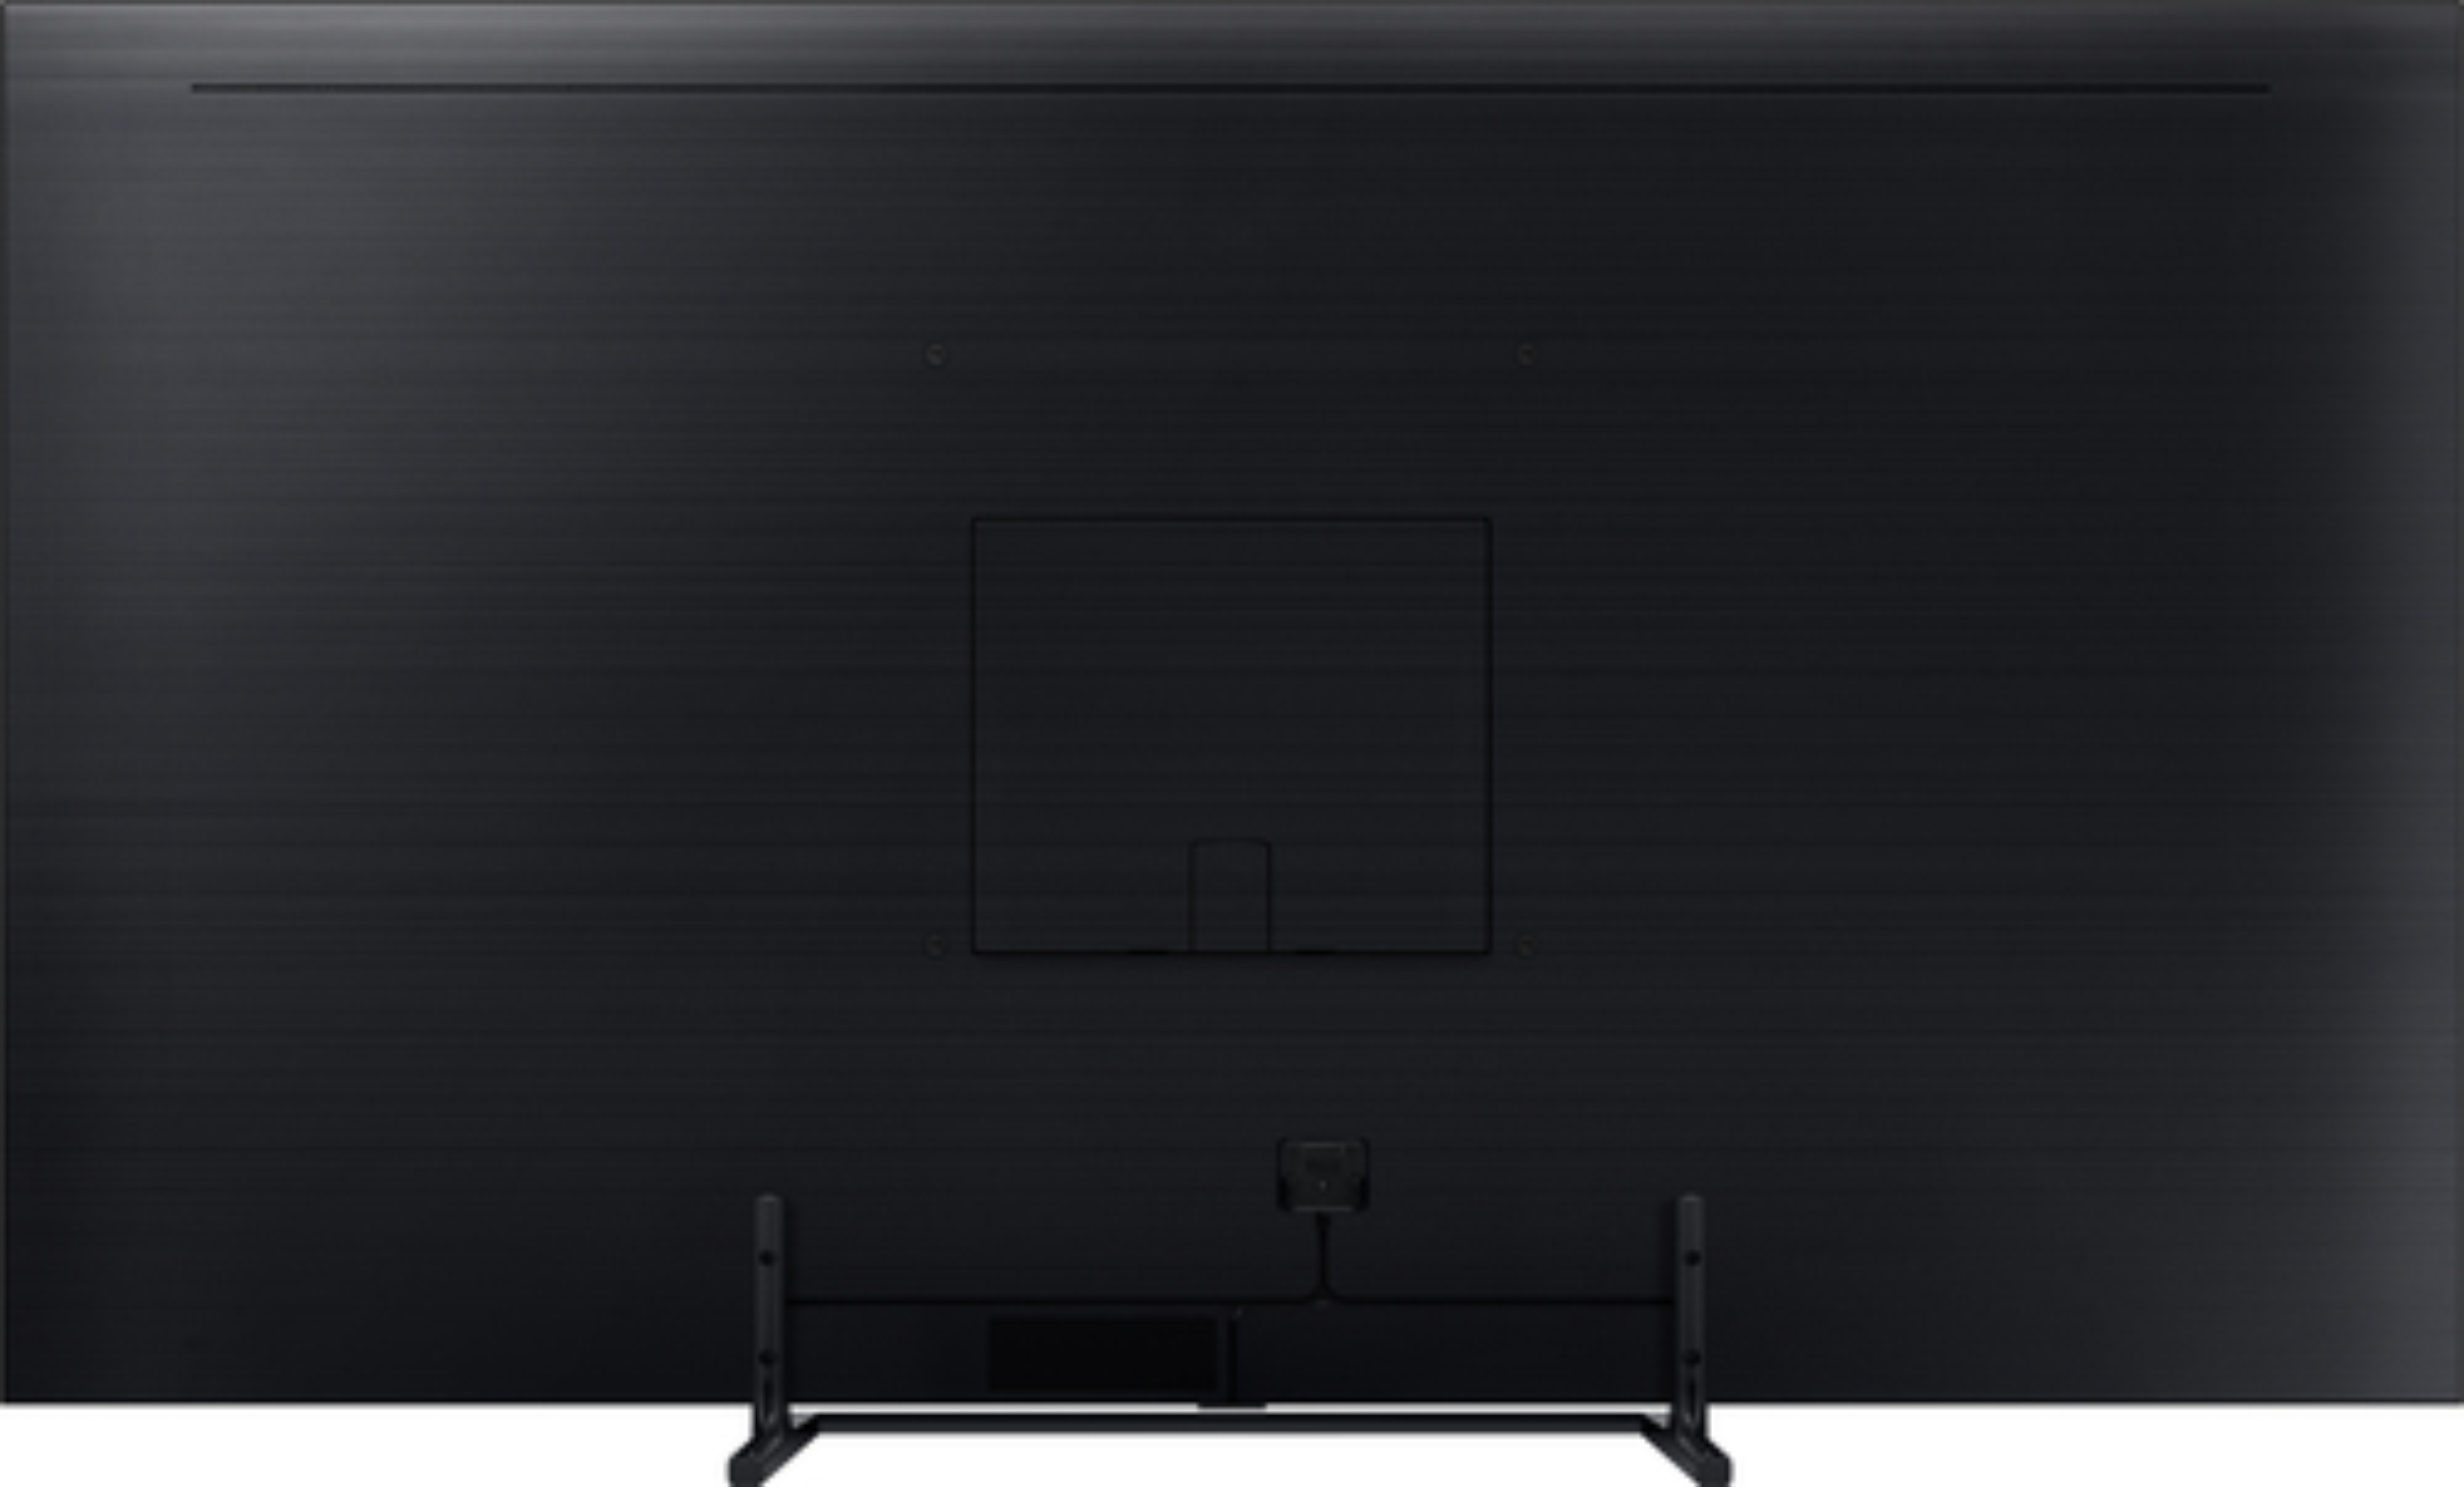 Image 2 for Samsung QN75Q9FNAFXZA